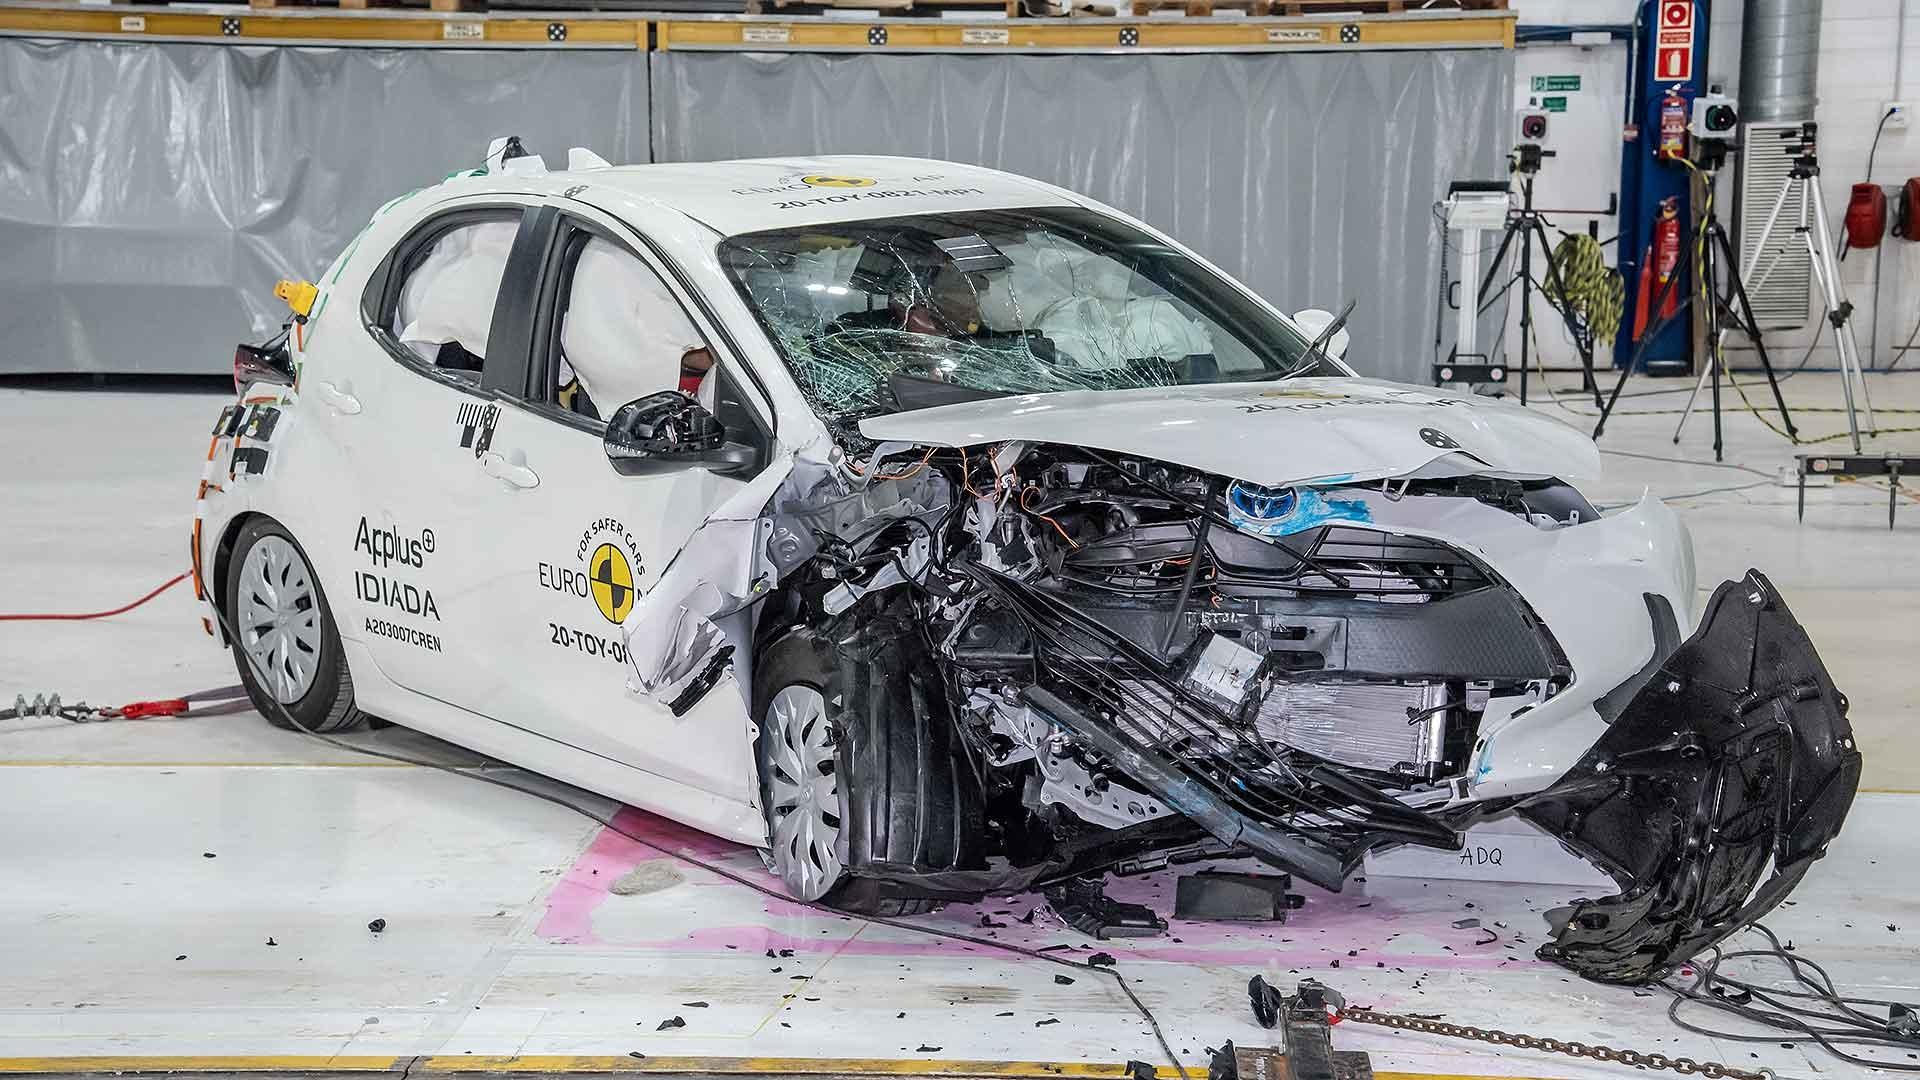 2020 Toyota Yaris Euro NCAP safety crash test